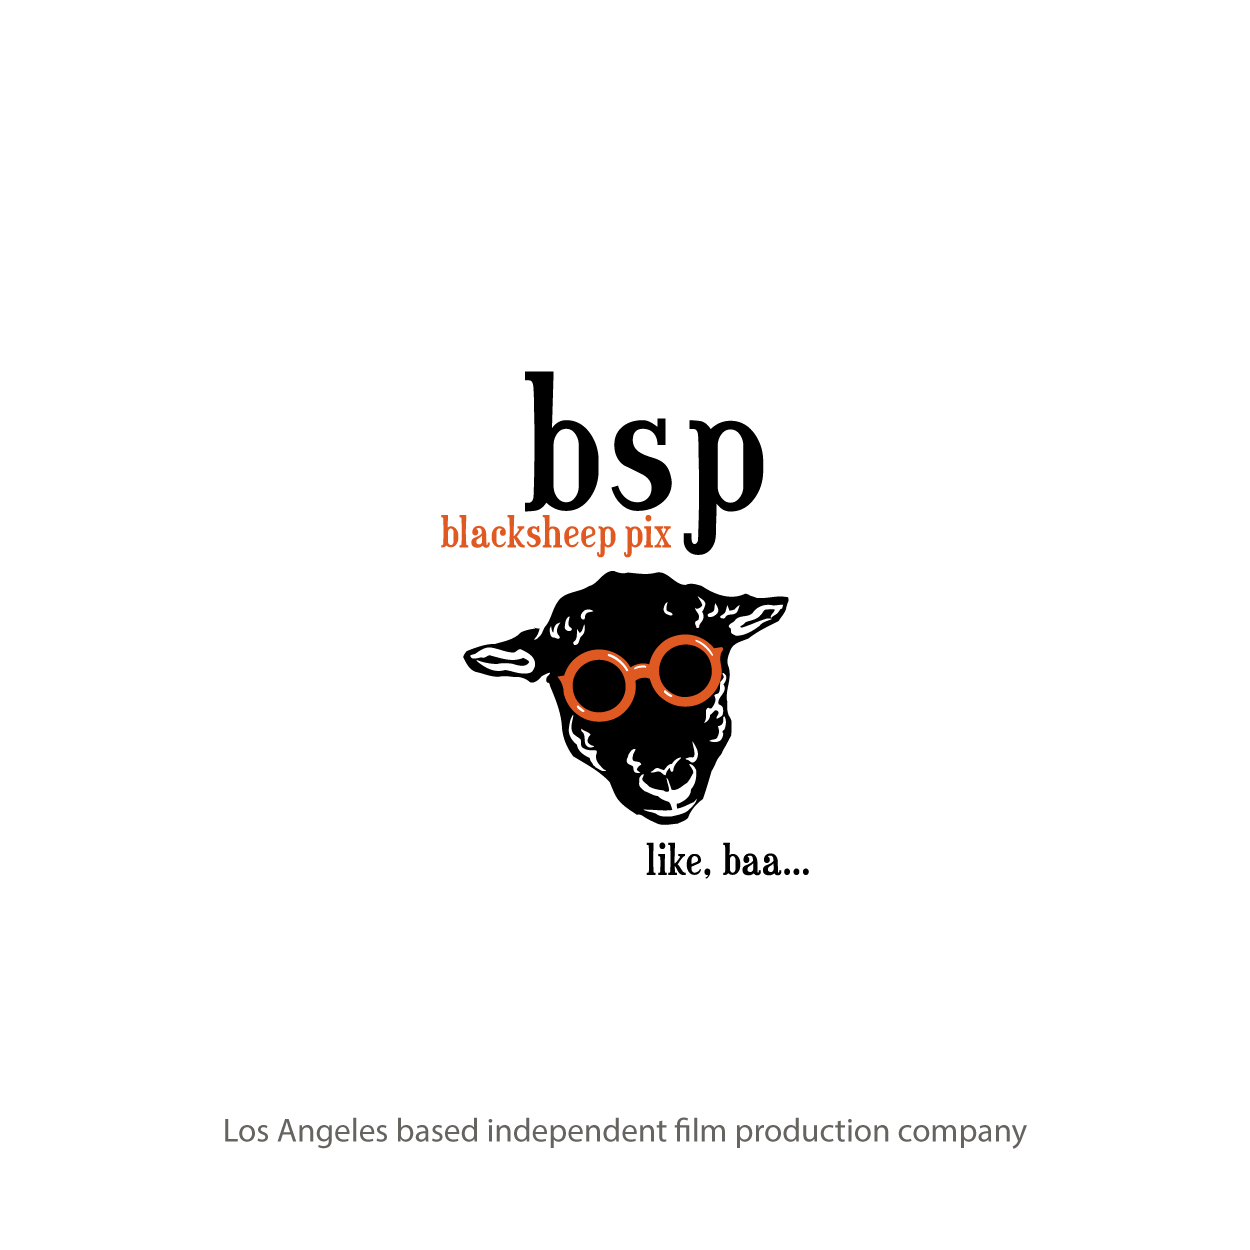 tjungle_design_logos-11.jpg